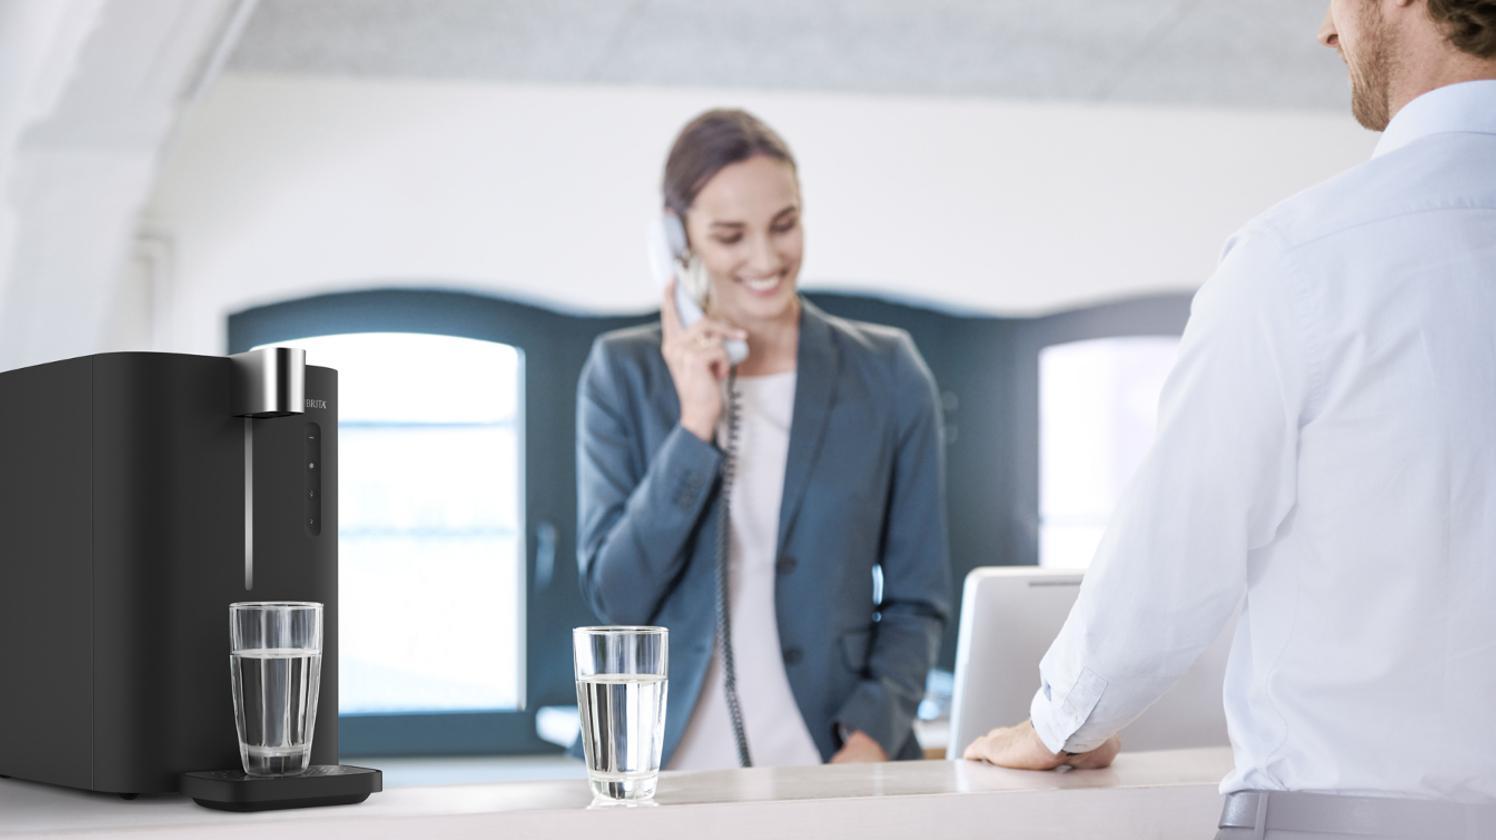 BRITA water dispenser vivreau top 15 co-worker